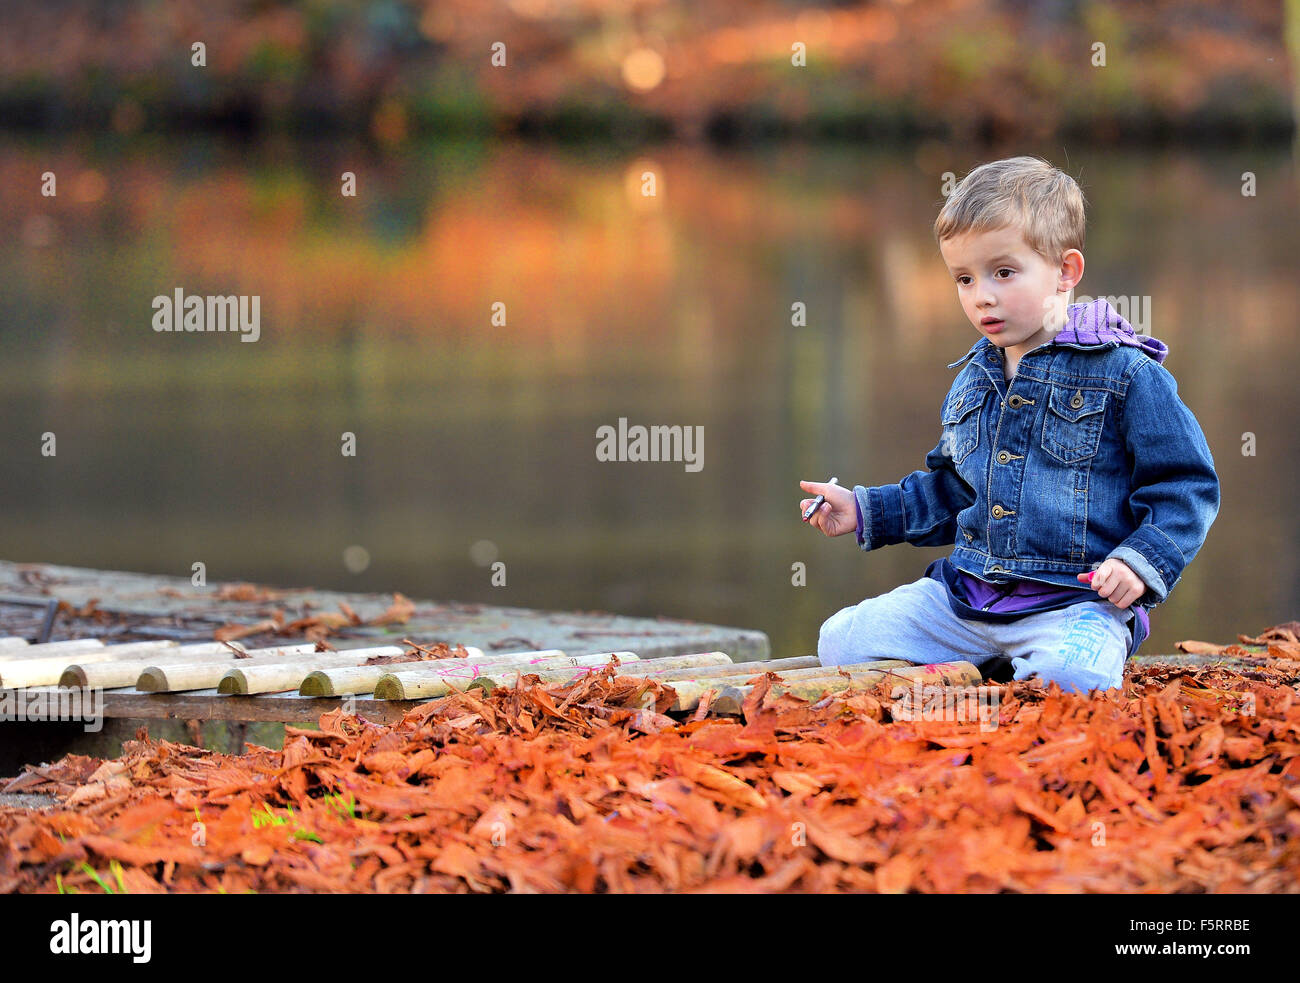 Prague, Czech Republic. 8th Nov, 2015. A boy enjoys warm and sunny autumn weather in Prague, Czech Republic, on Stock Photo